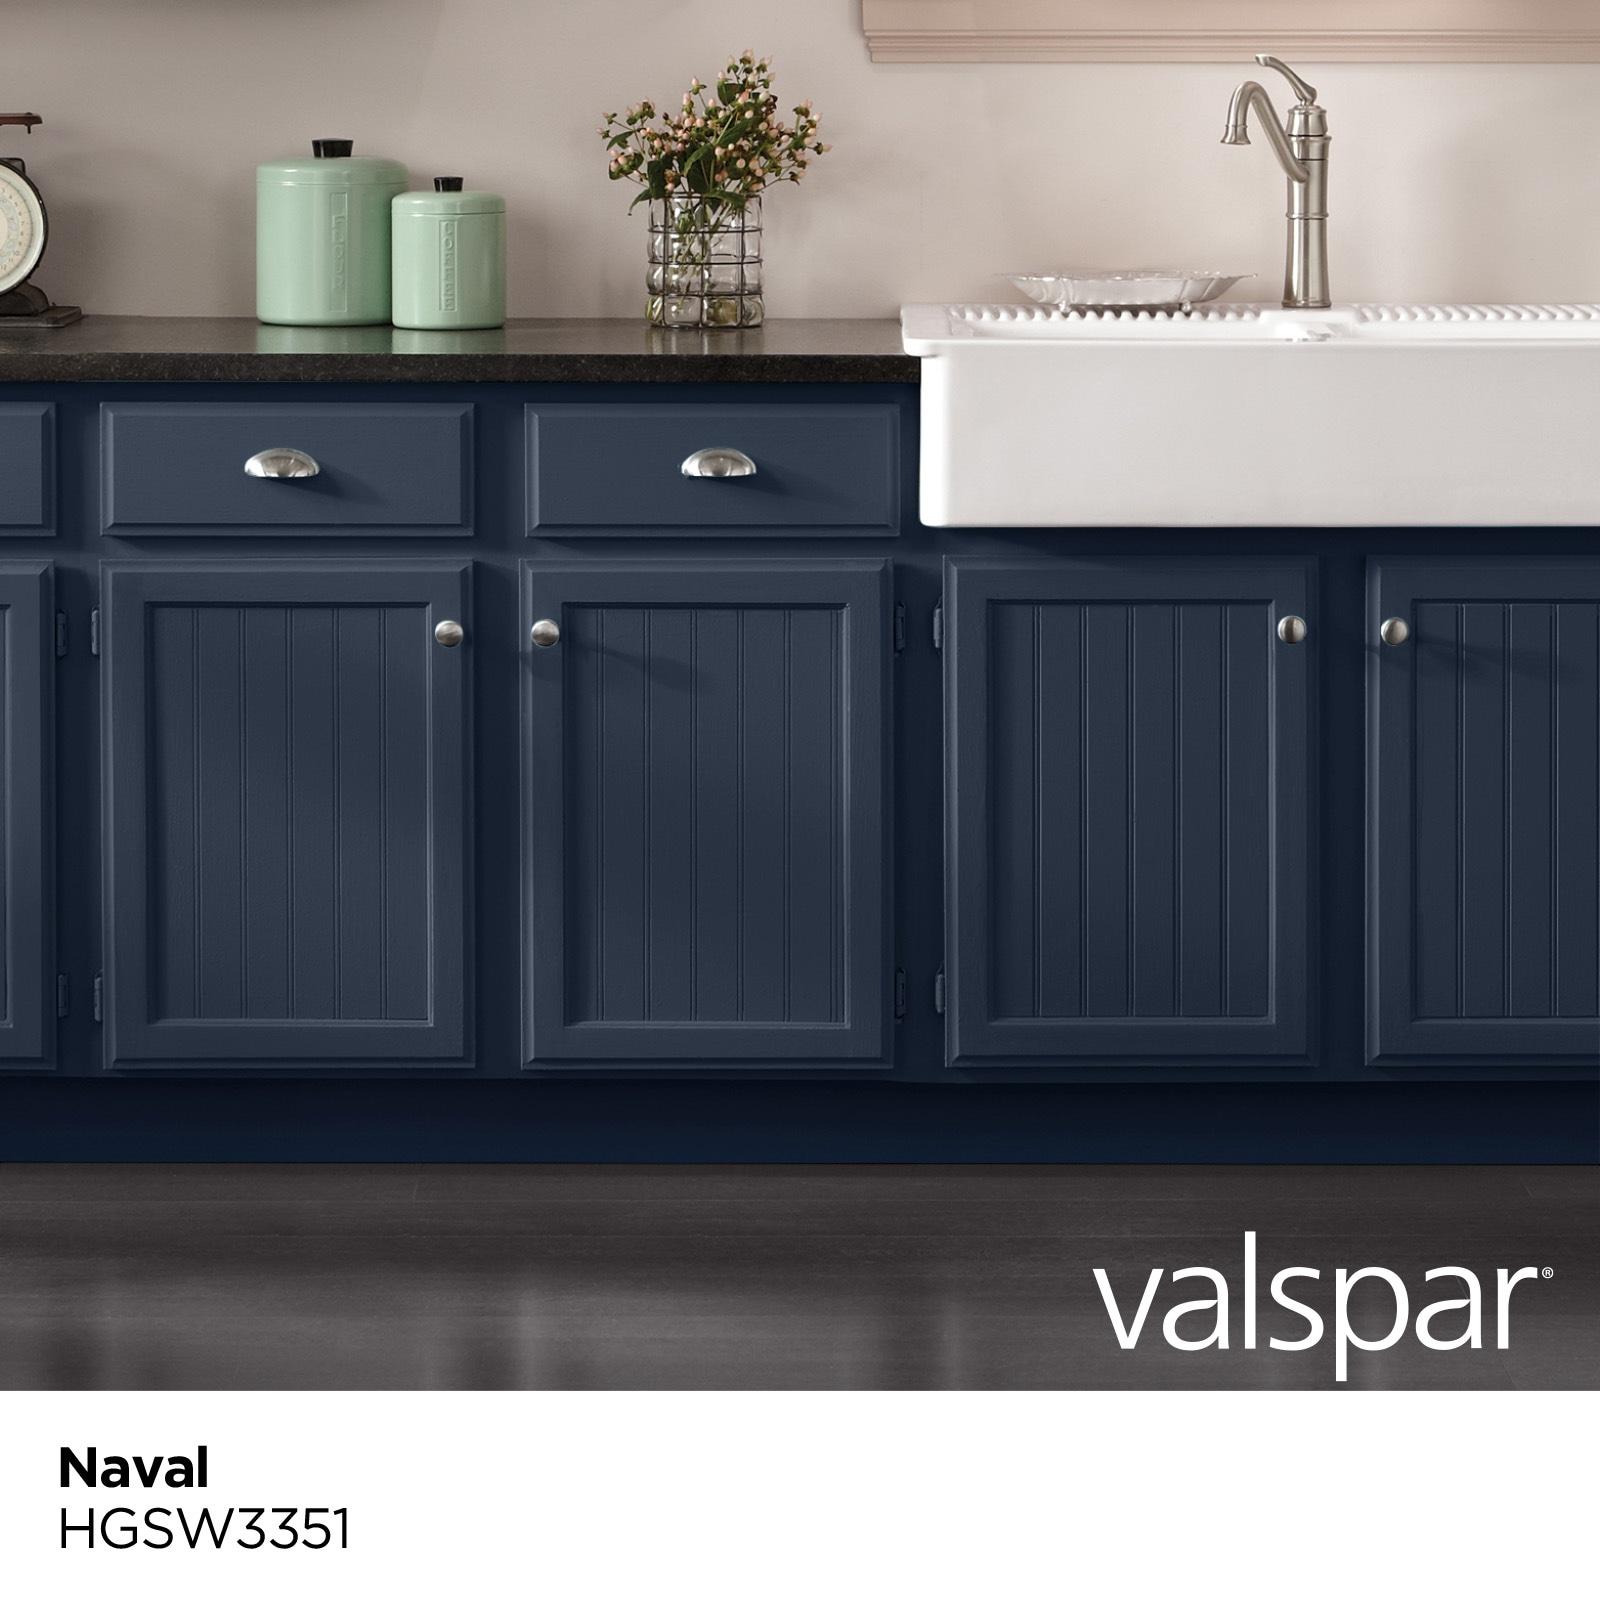 Valspar Cabinet and Furniture Satin Naval Hgsw9 Enamel Interior ...